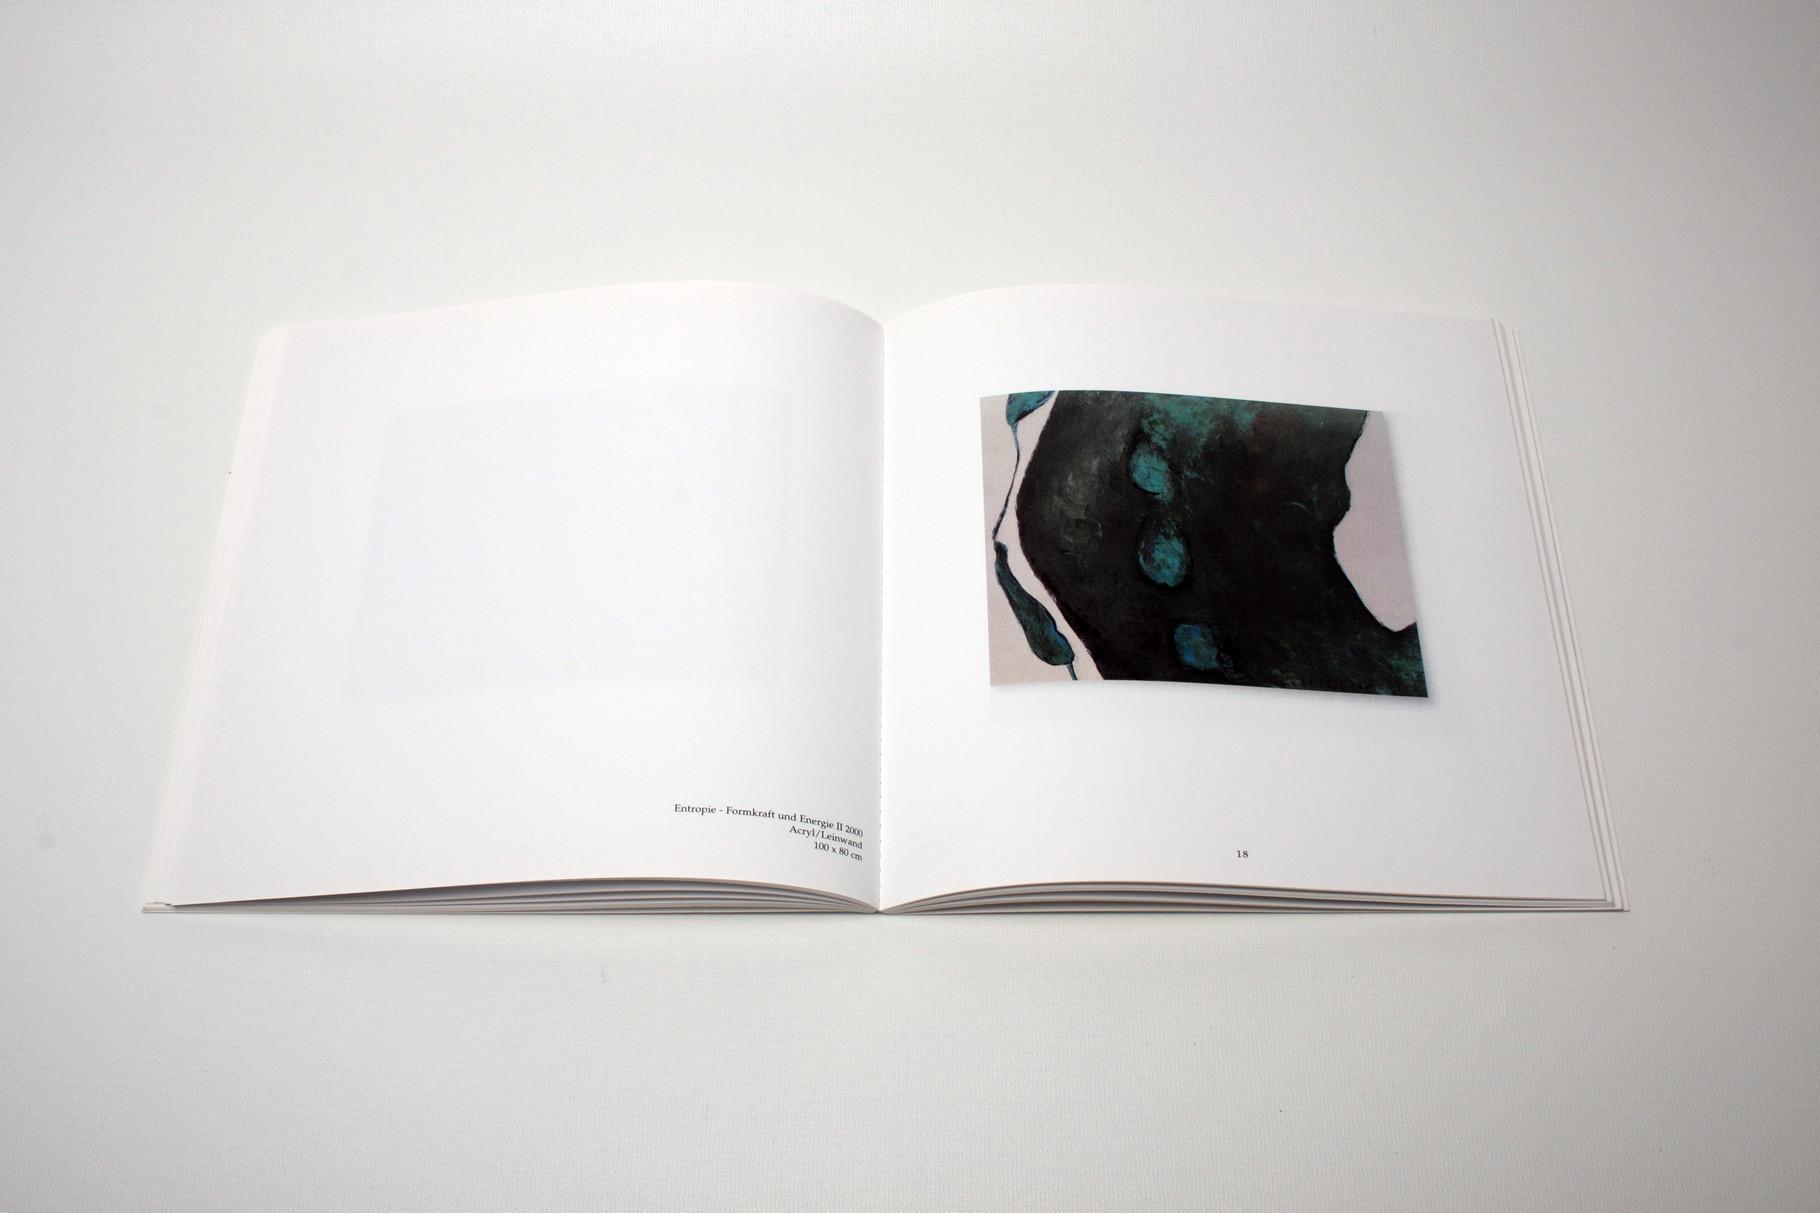 Kunstkatalog Digital Druck